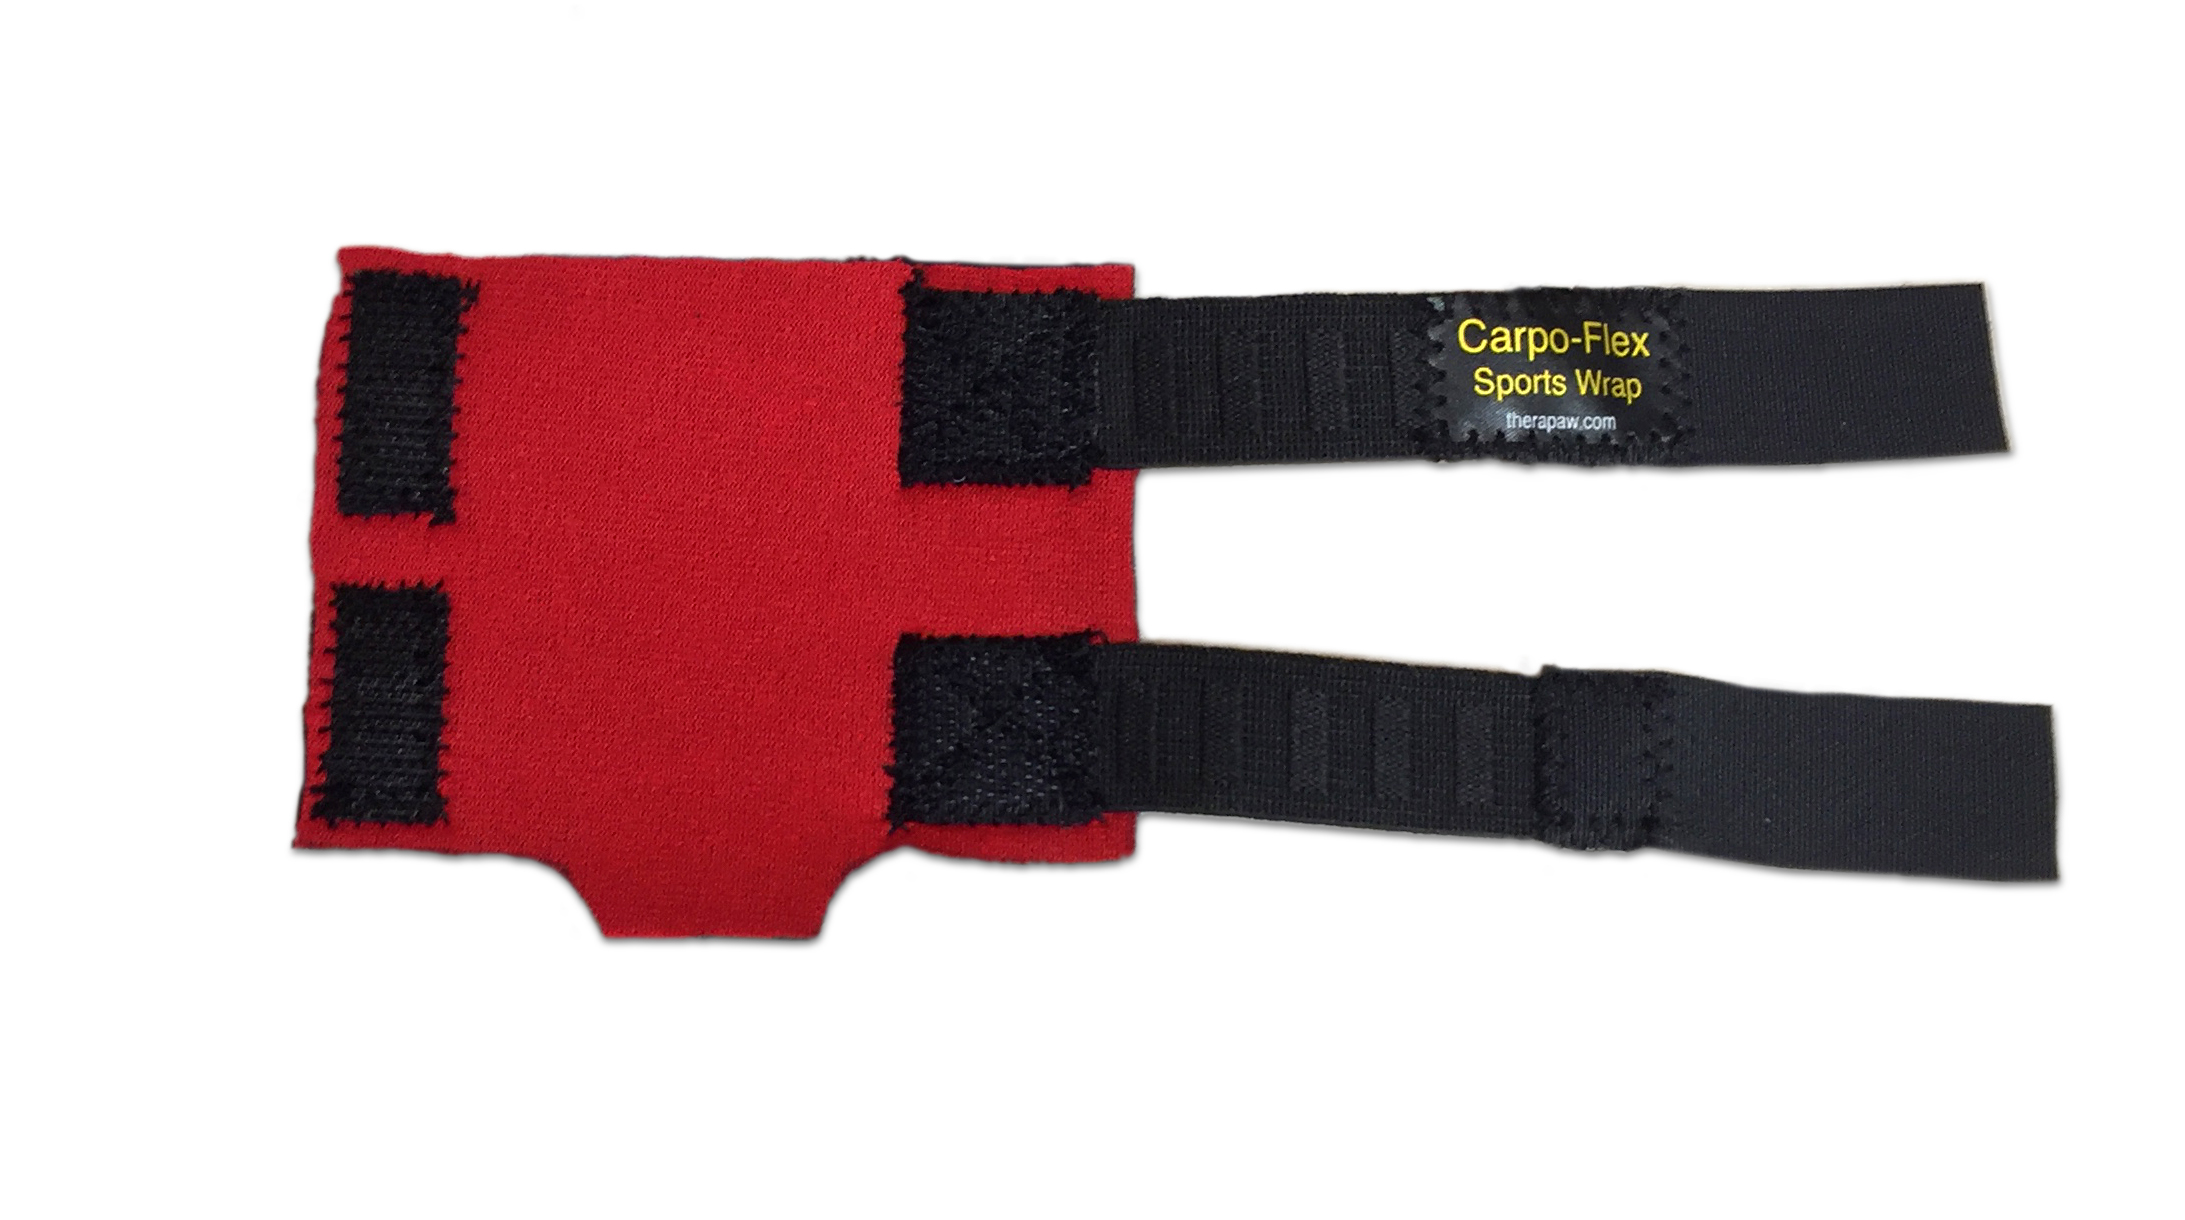 Carpo-Flex Sports Wrap Mini